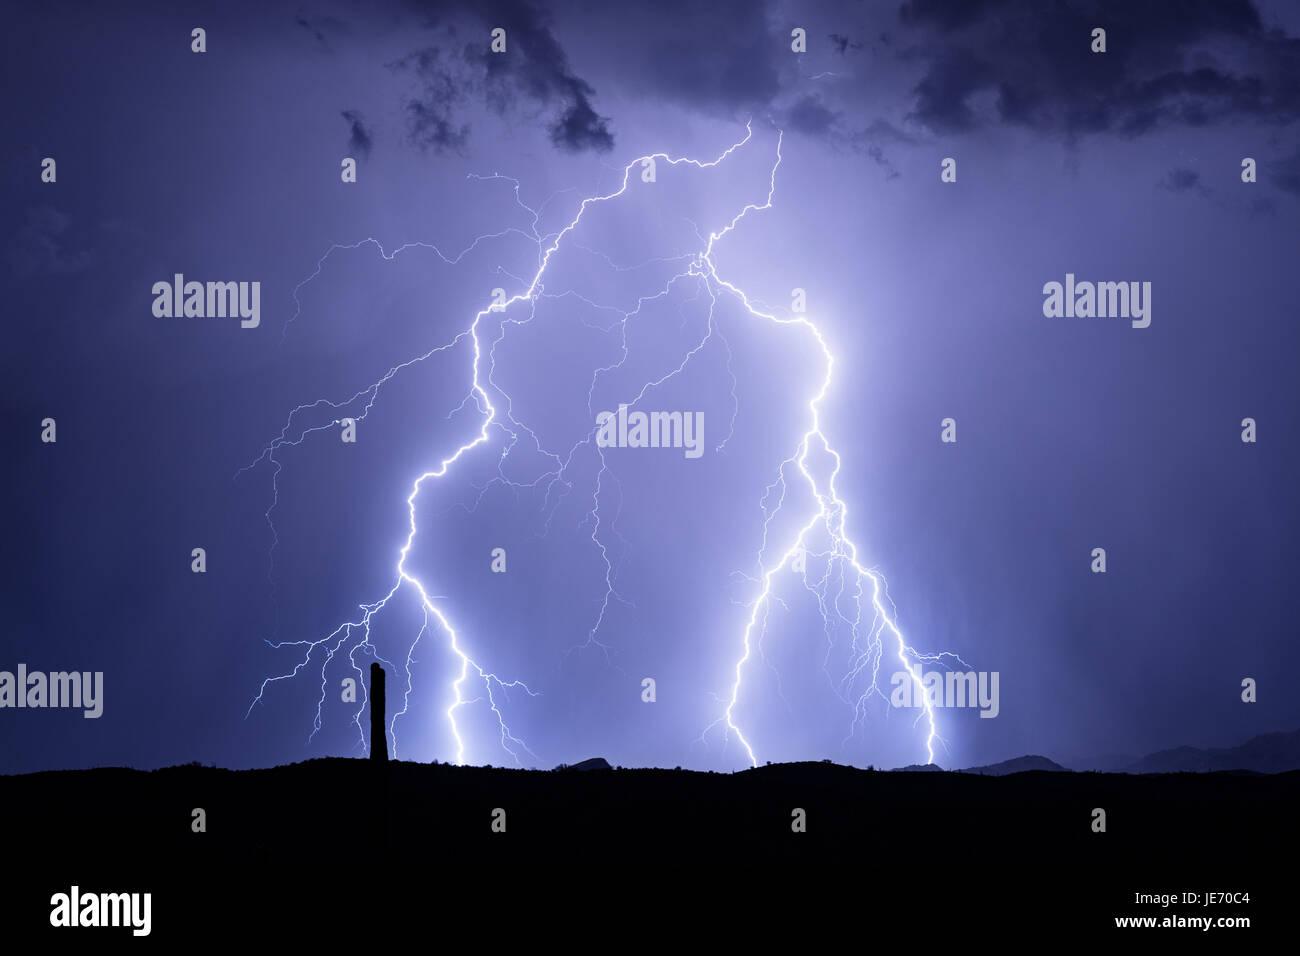 Lightning bolts flash during a summer monsoon storm Stock Photo